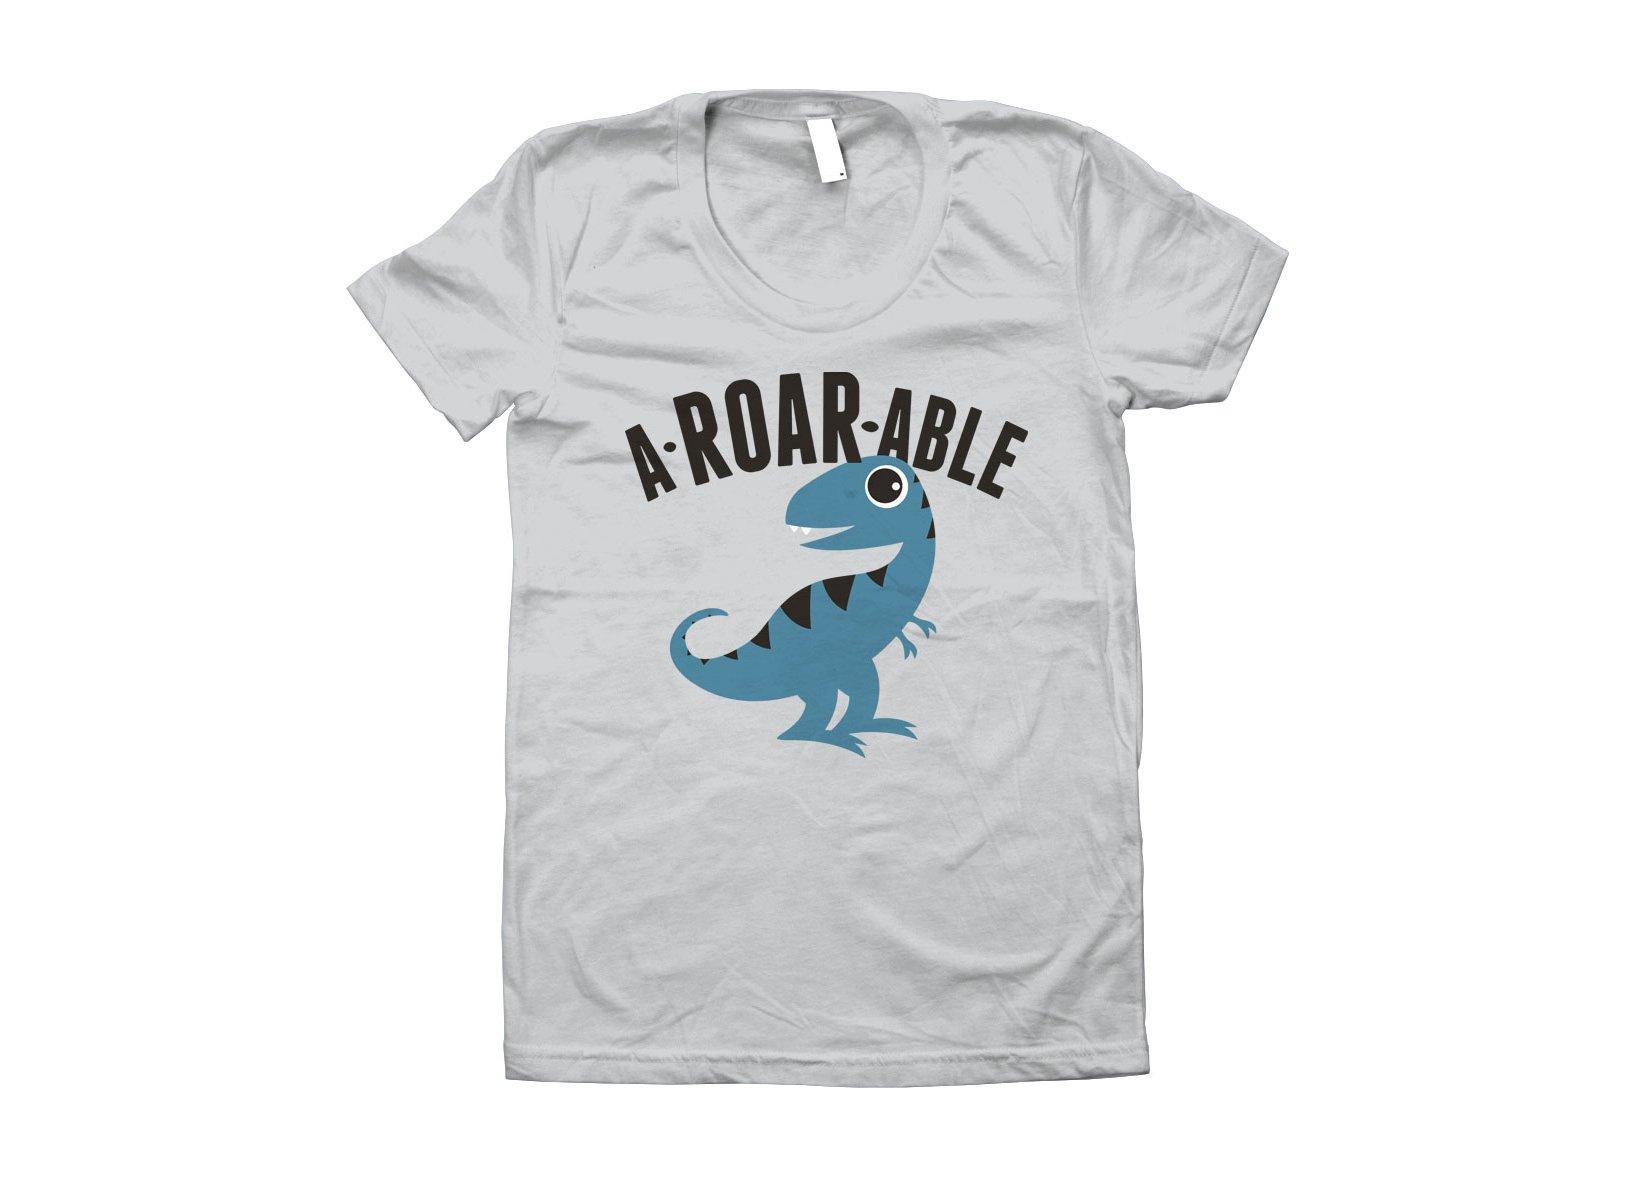 A-Roar-Able on Juniors T-Shirt